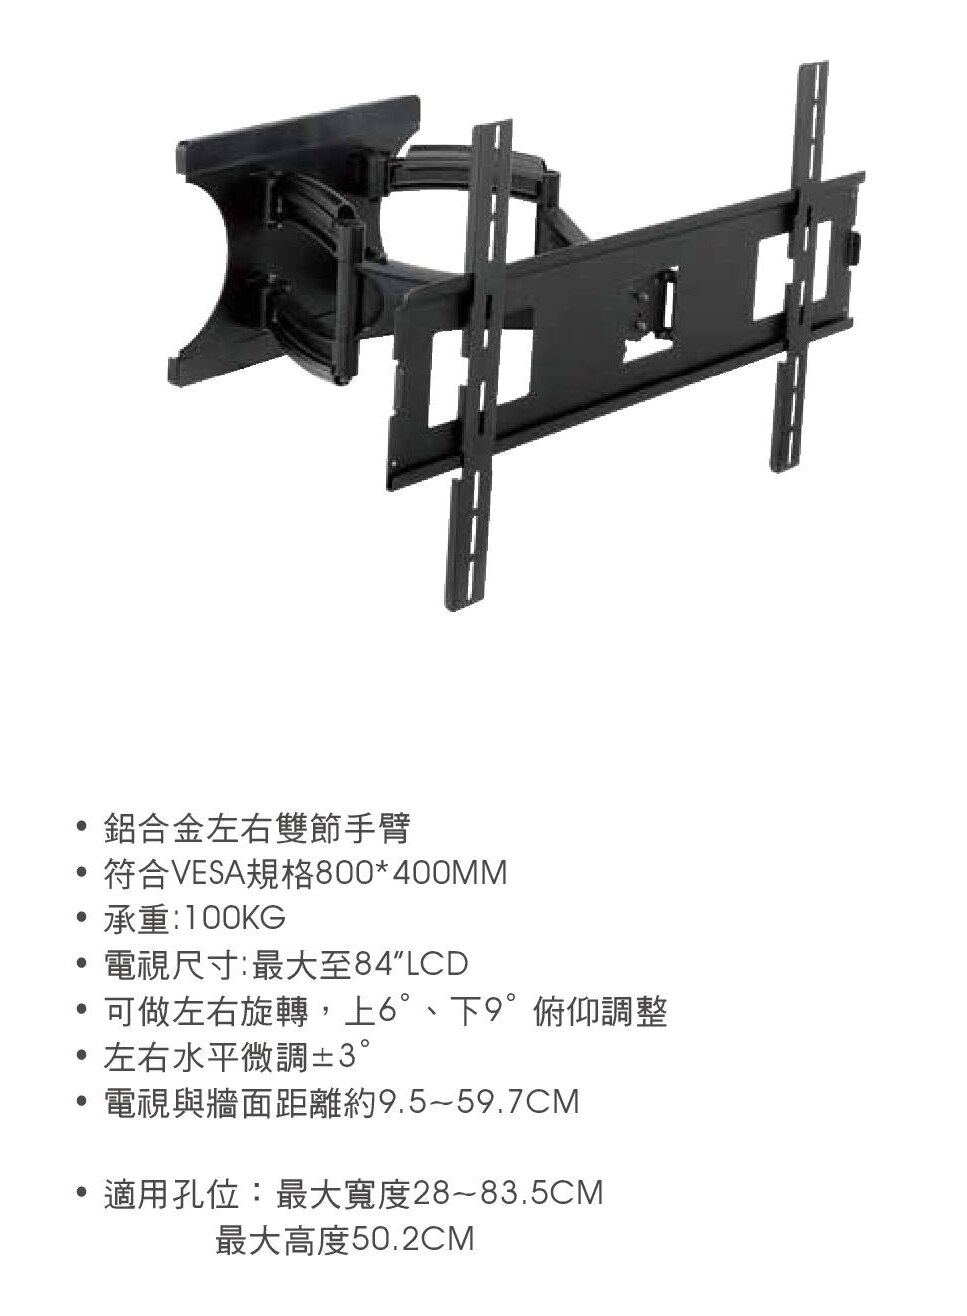 AviewS-CMW-277 / 鋁合金液晶壁掛架 / 台灣製造 1